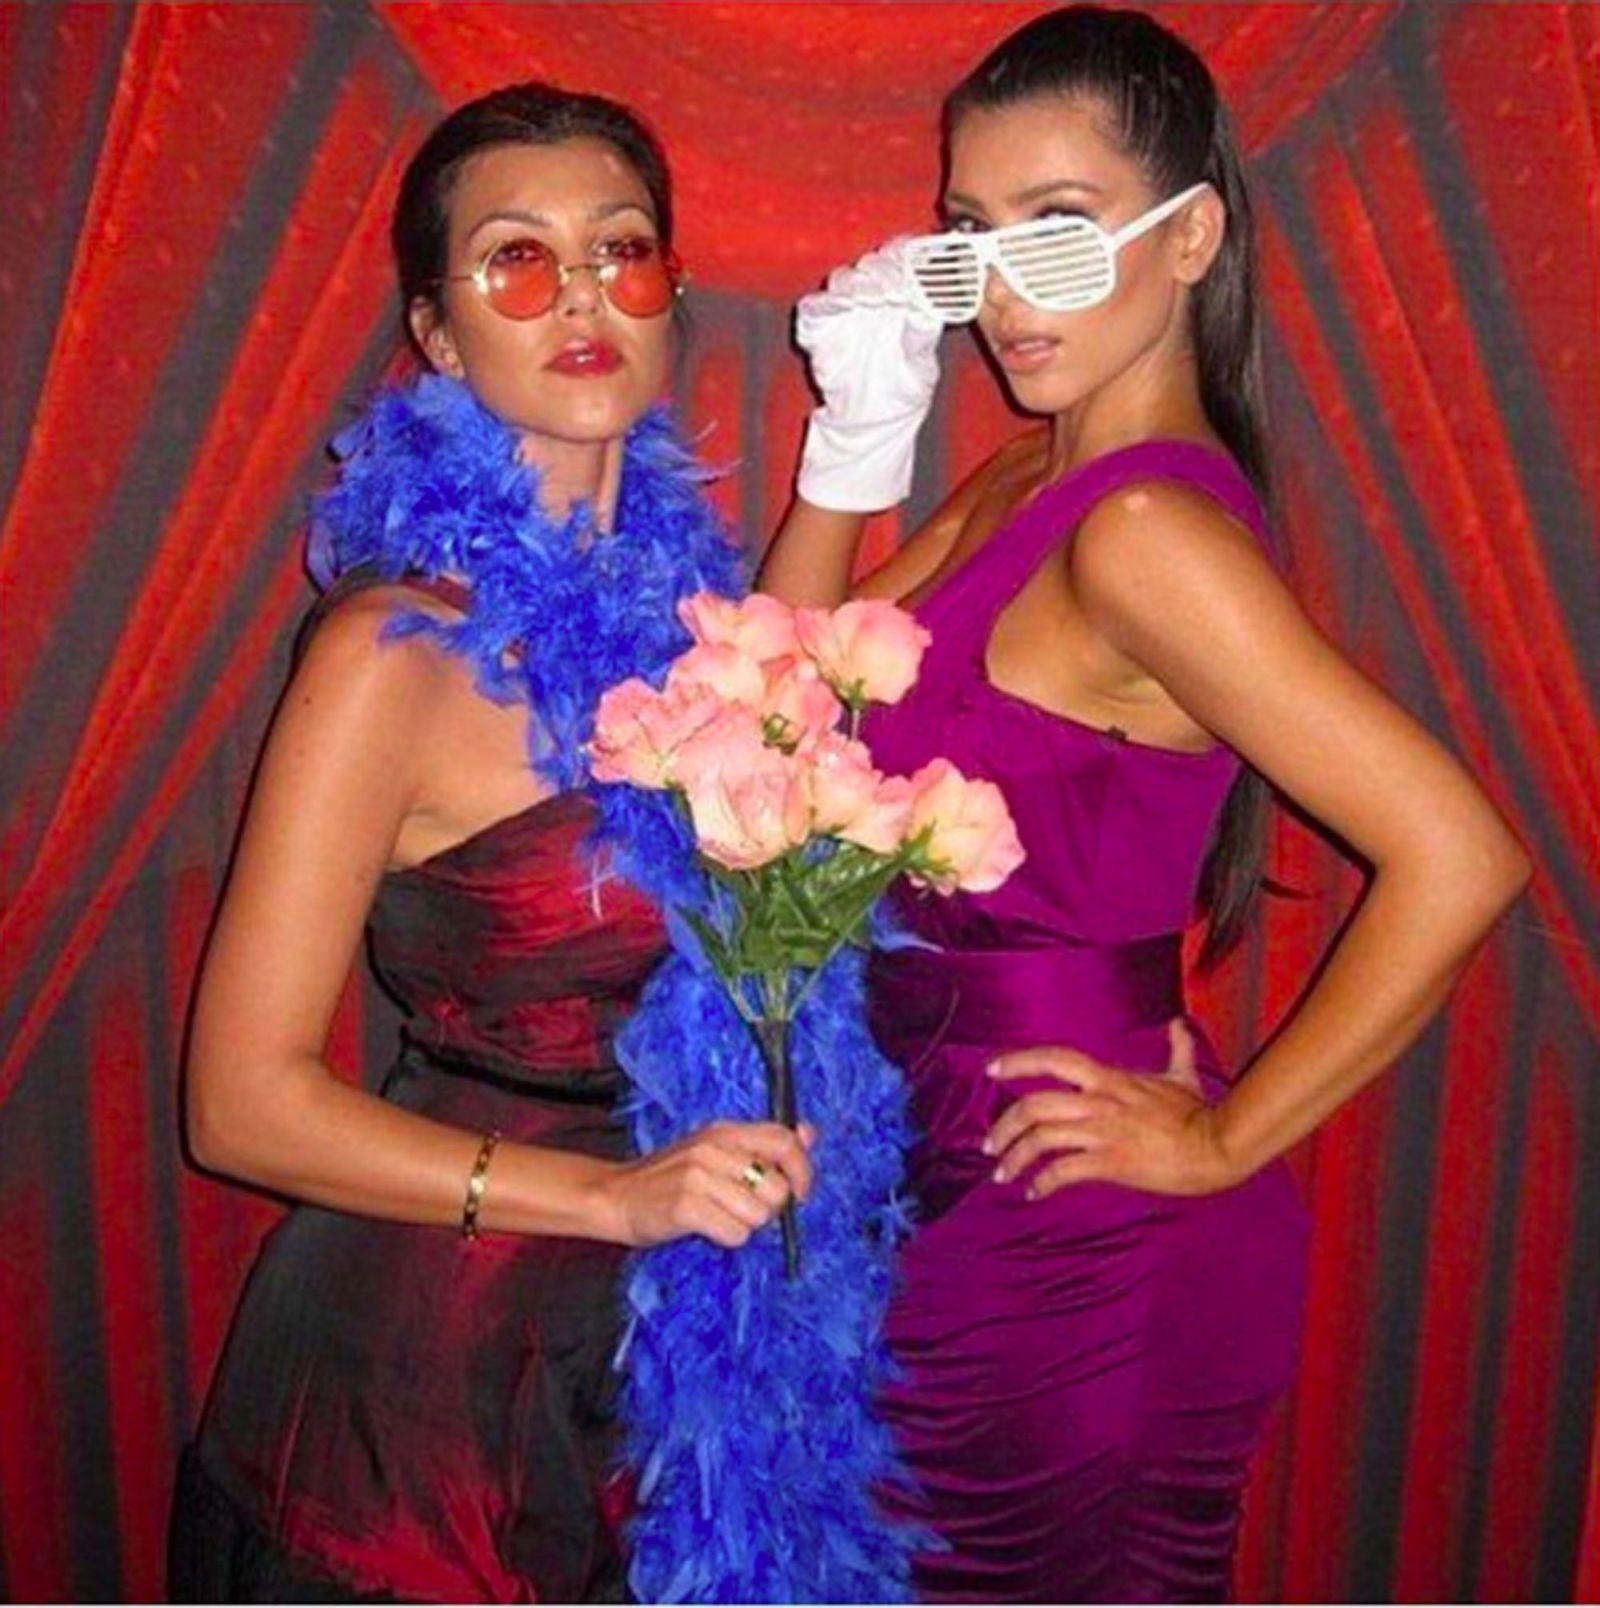 Unrecognizable Photos Of The Kardashians Kardashian And Celebrity - 38 awkward prom photos ever